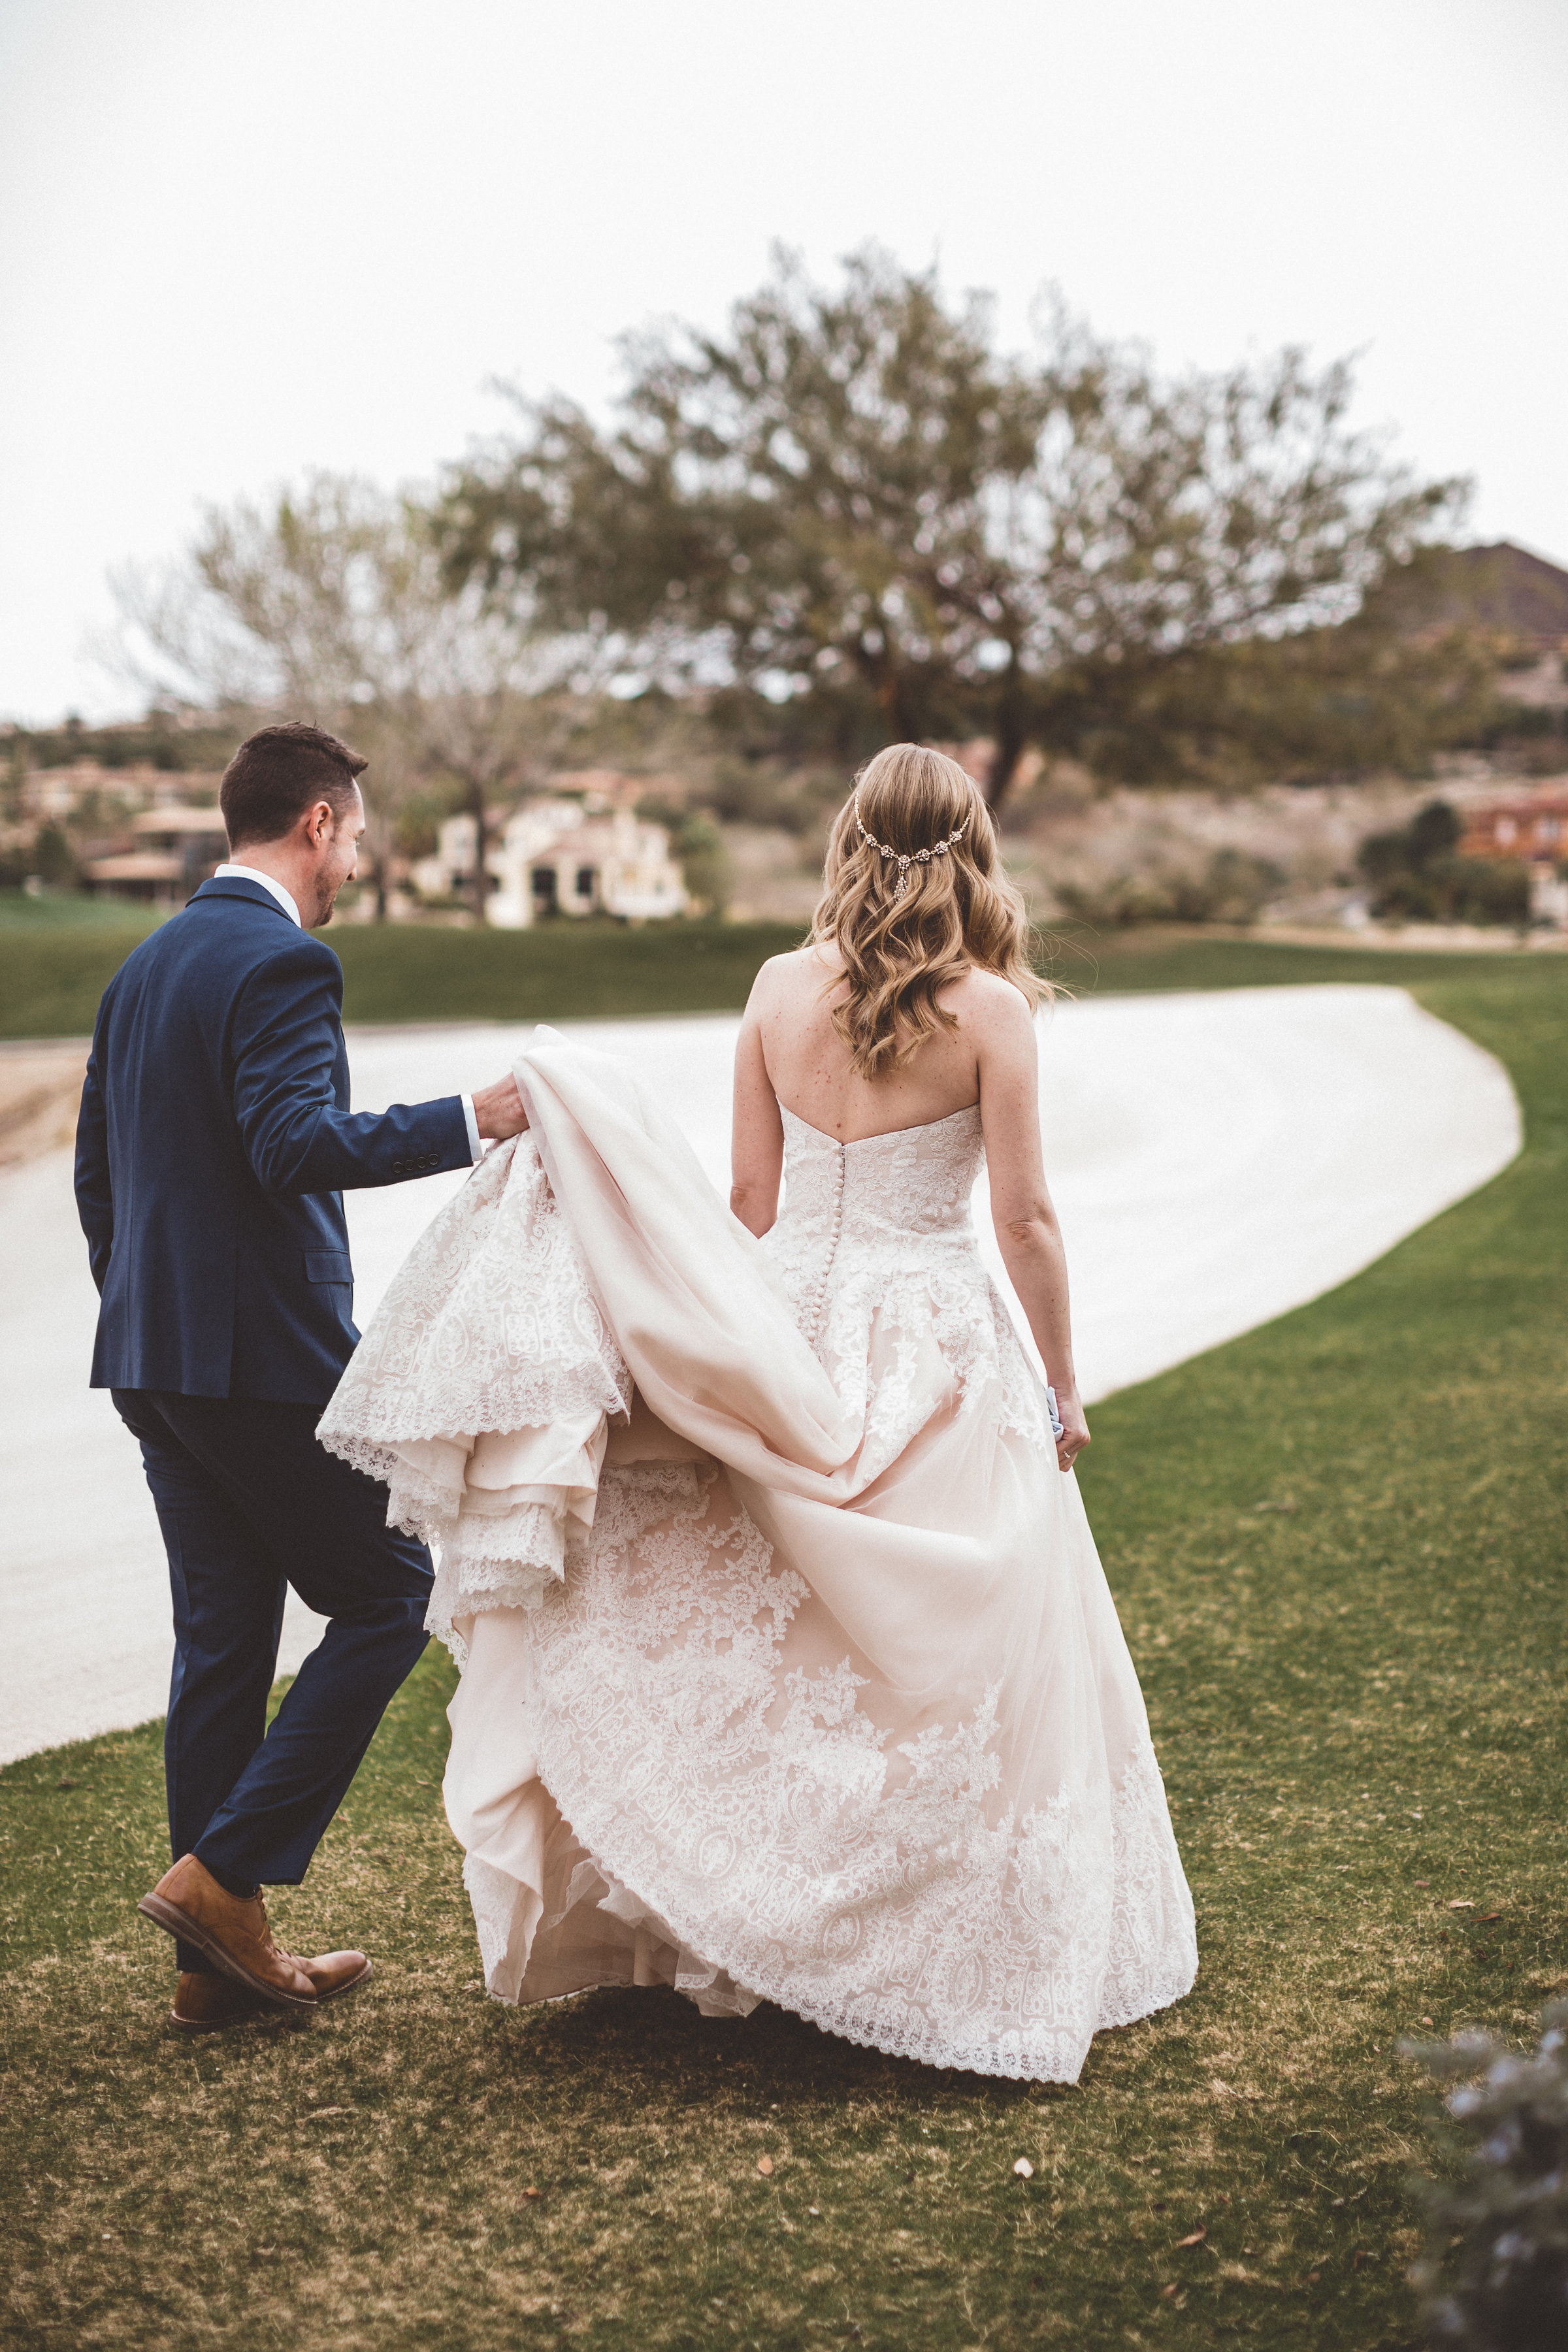 lindsey-and-ryan-intimate-winter-wedding16.jpg